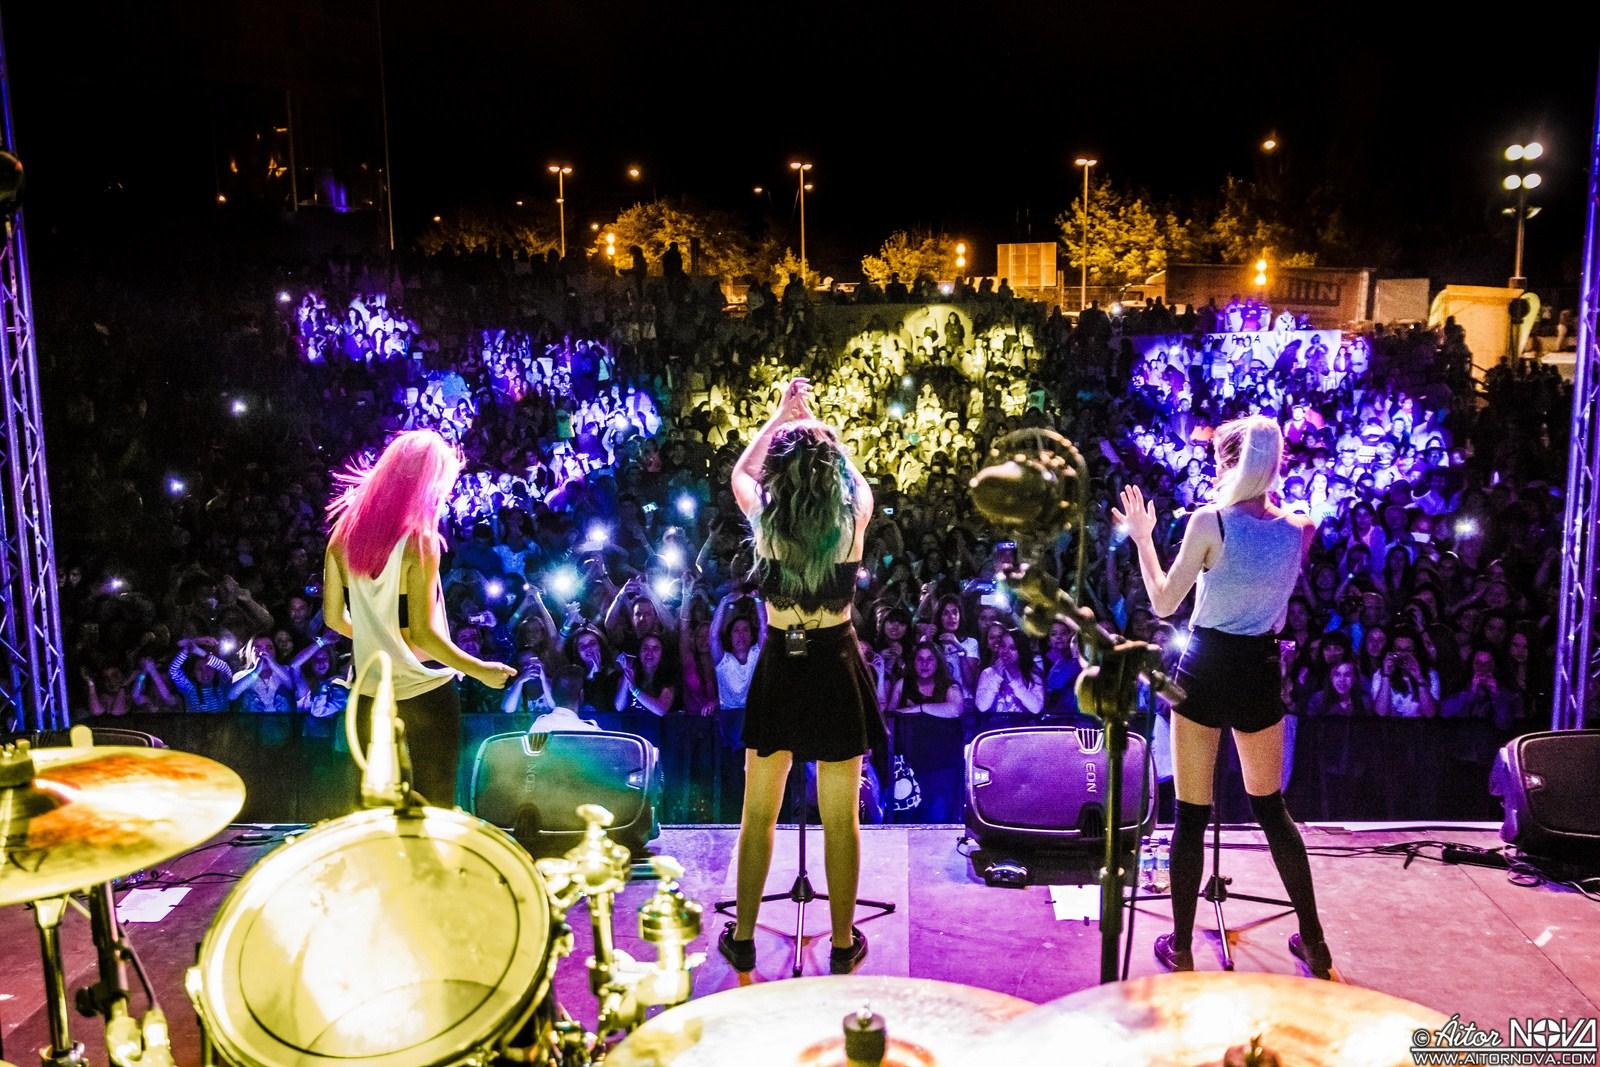 MusicAula-2015-Sweet-California-y-Persé-15